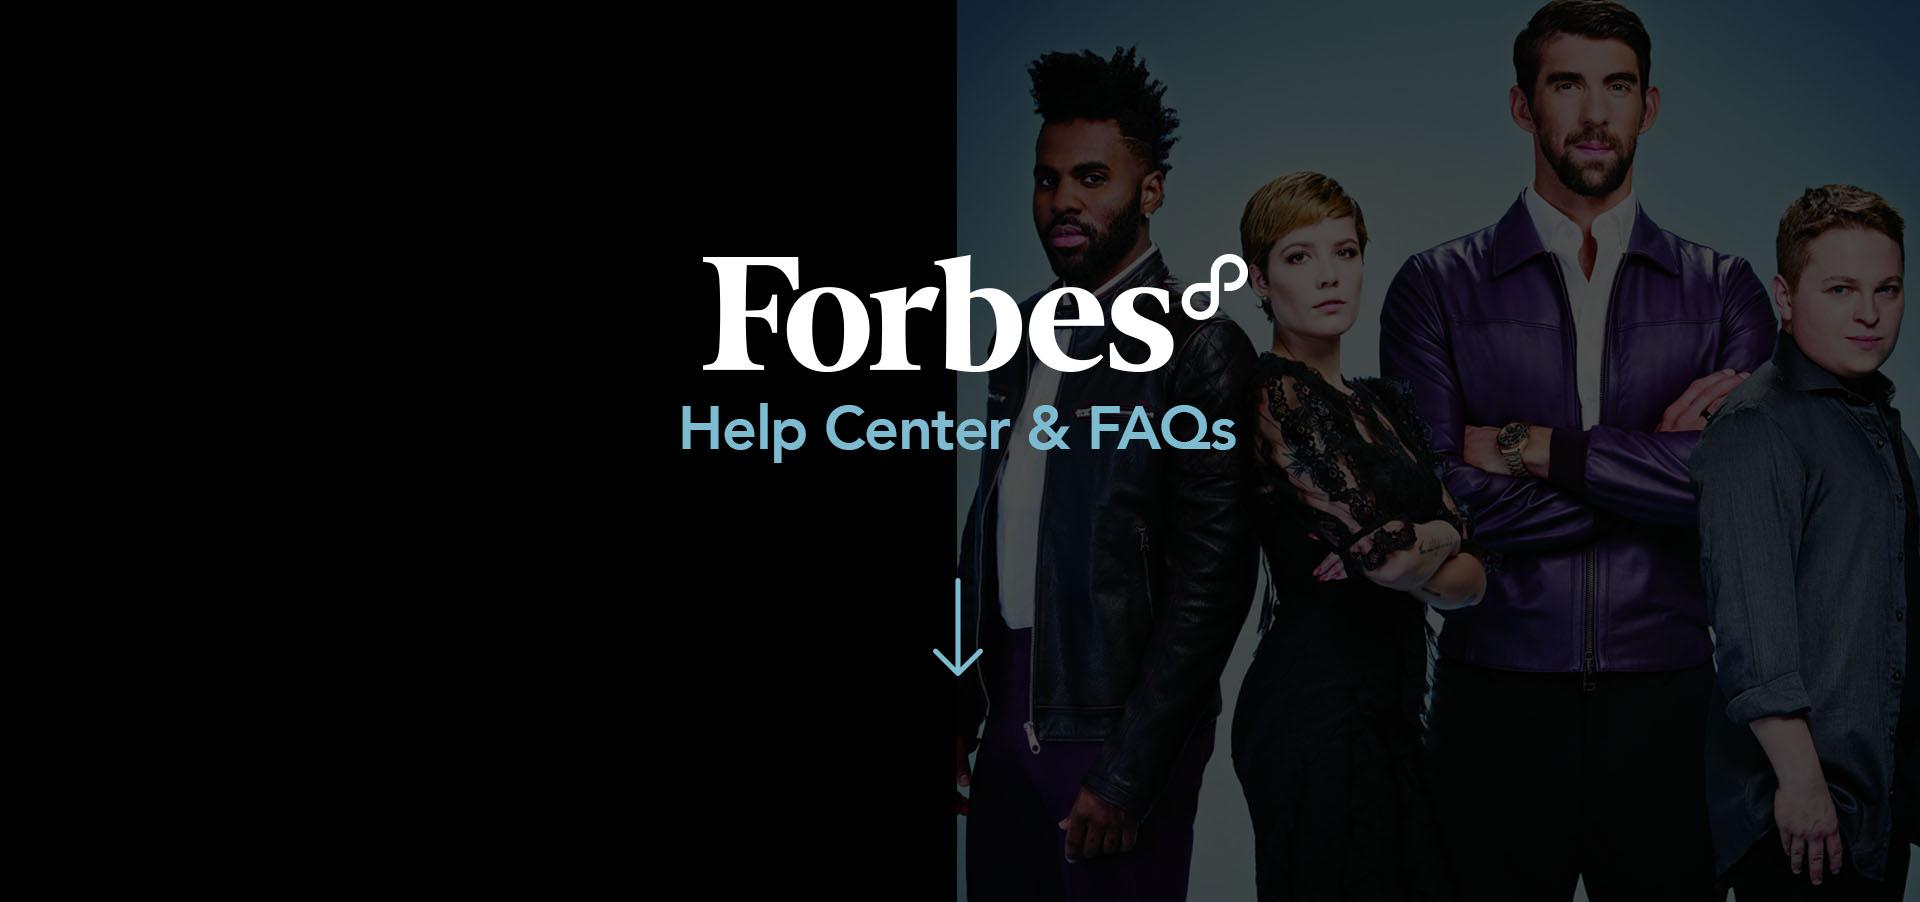 Forbes8 Help Center